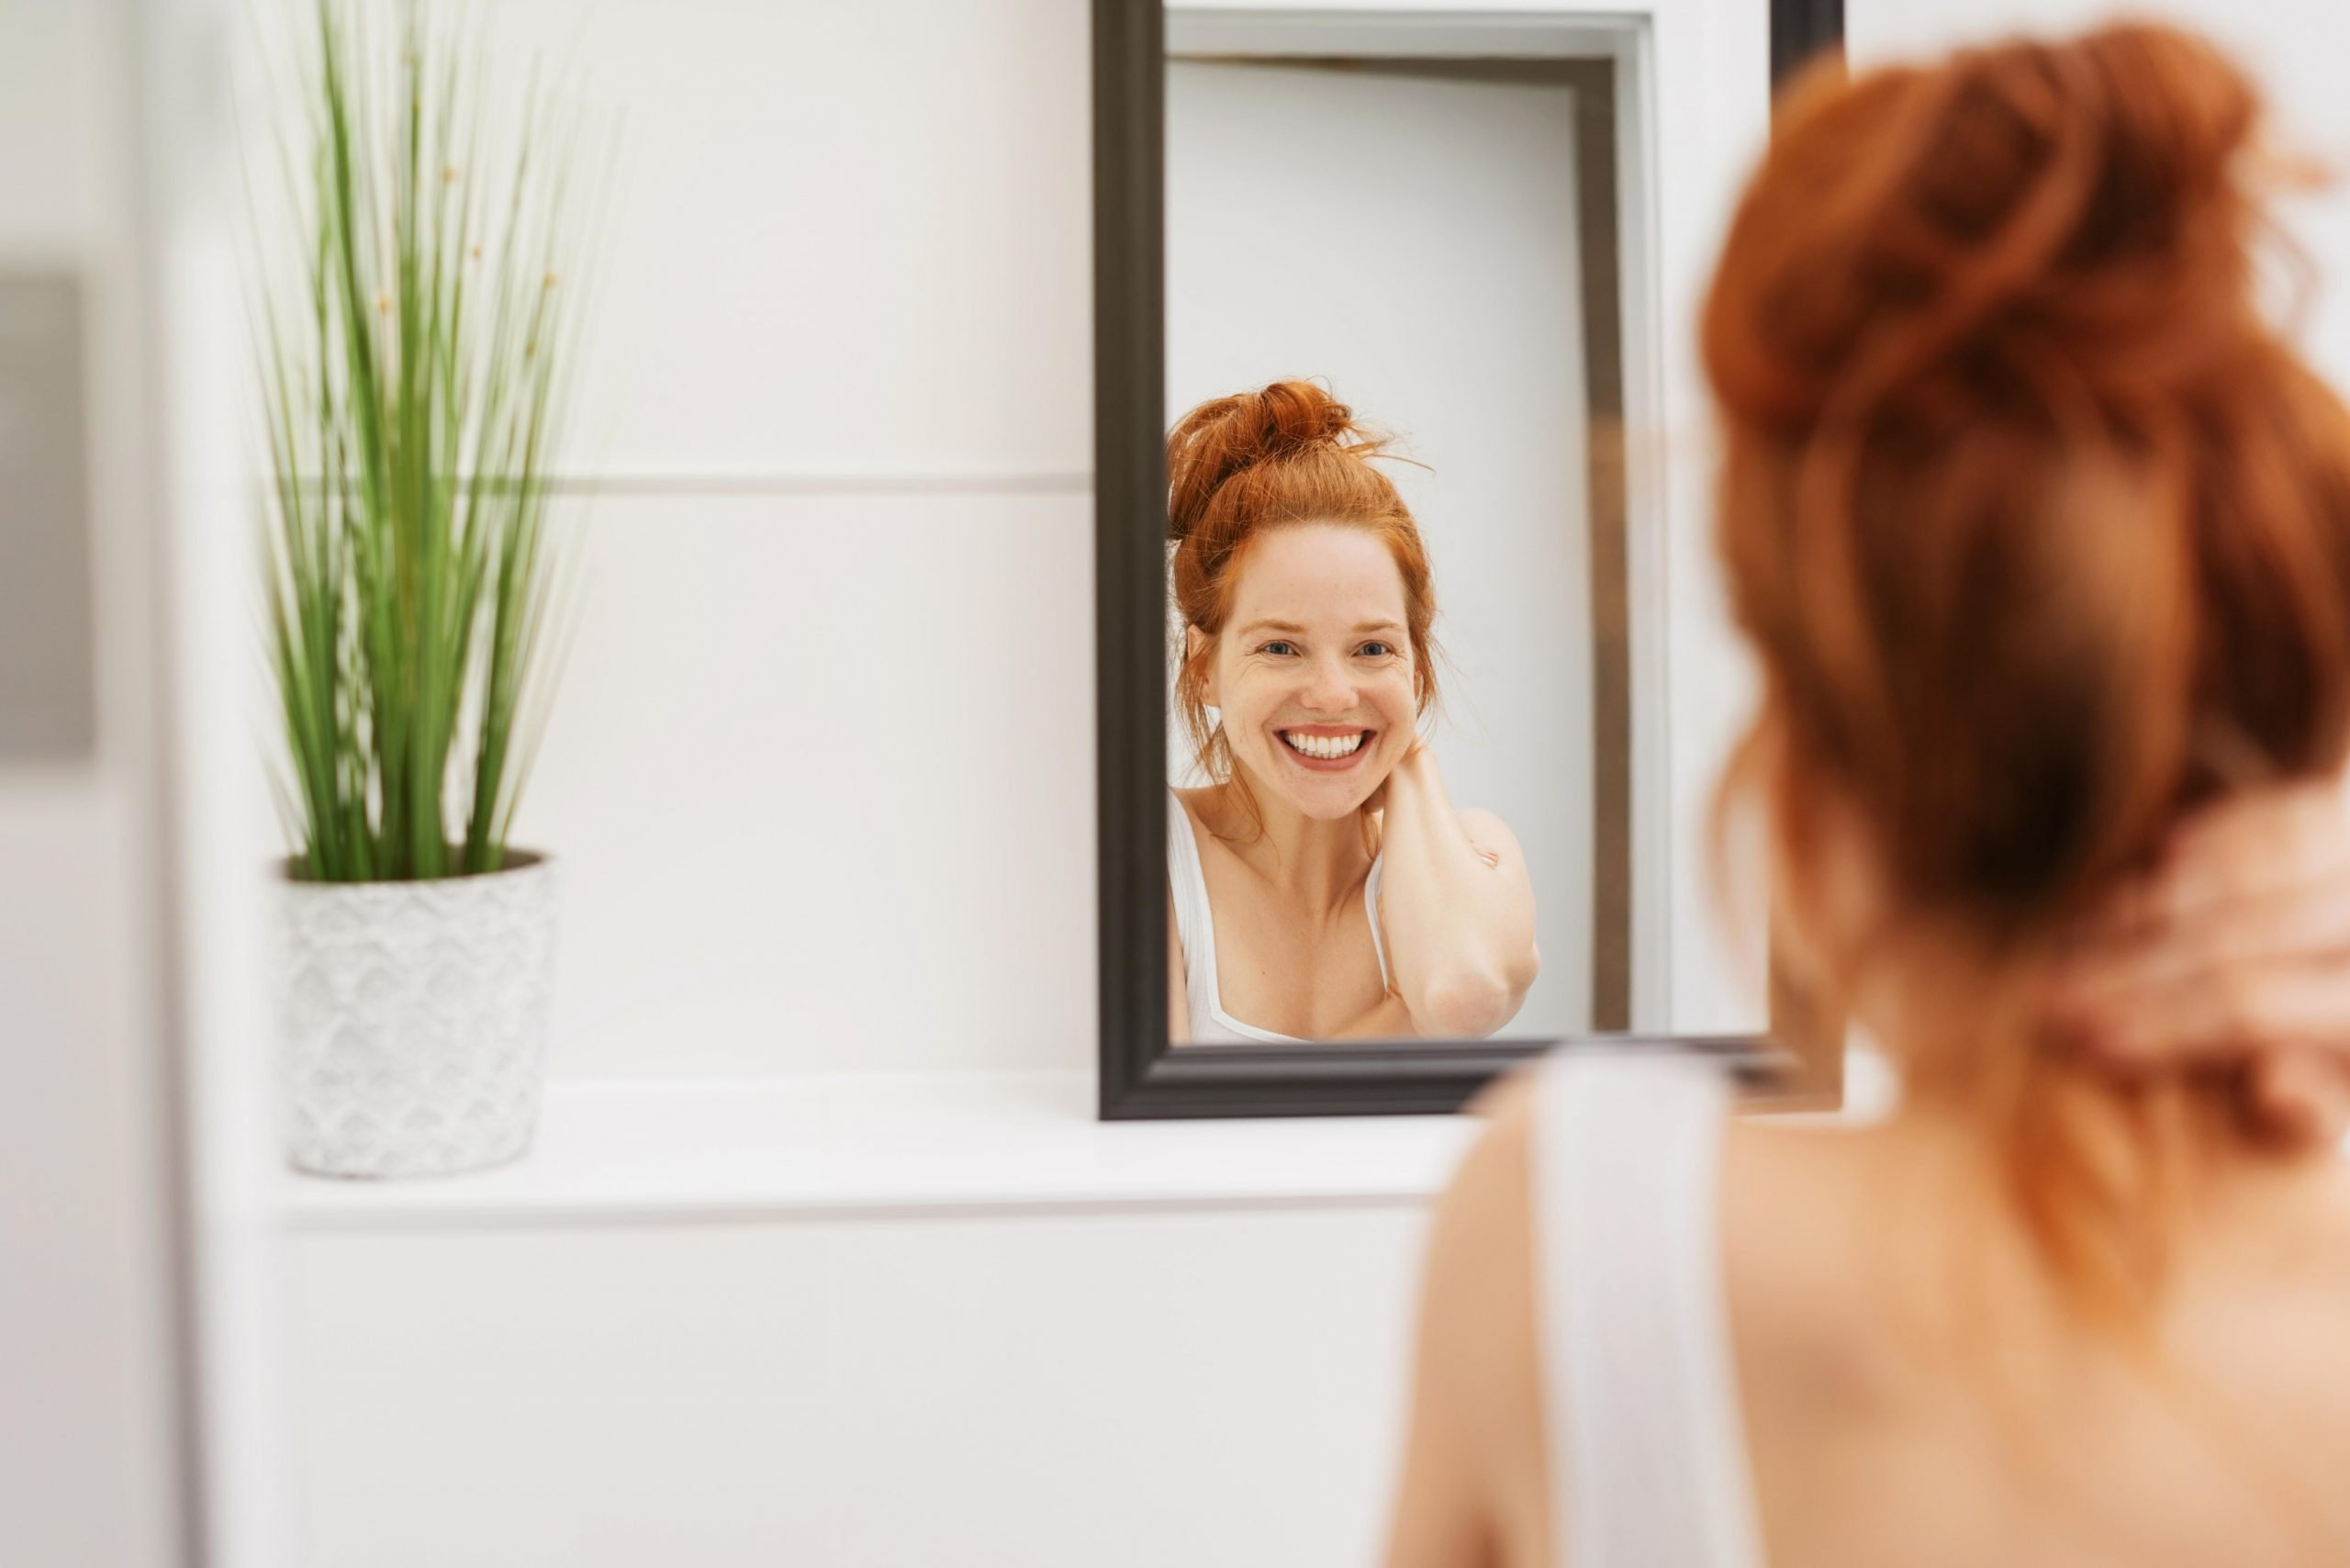 Needing A Mirror